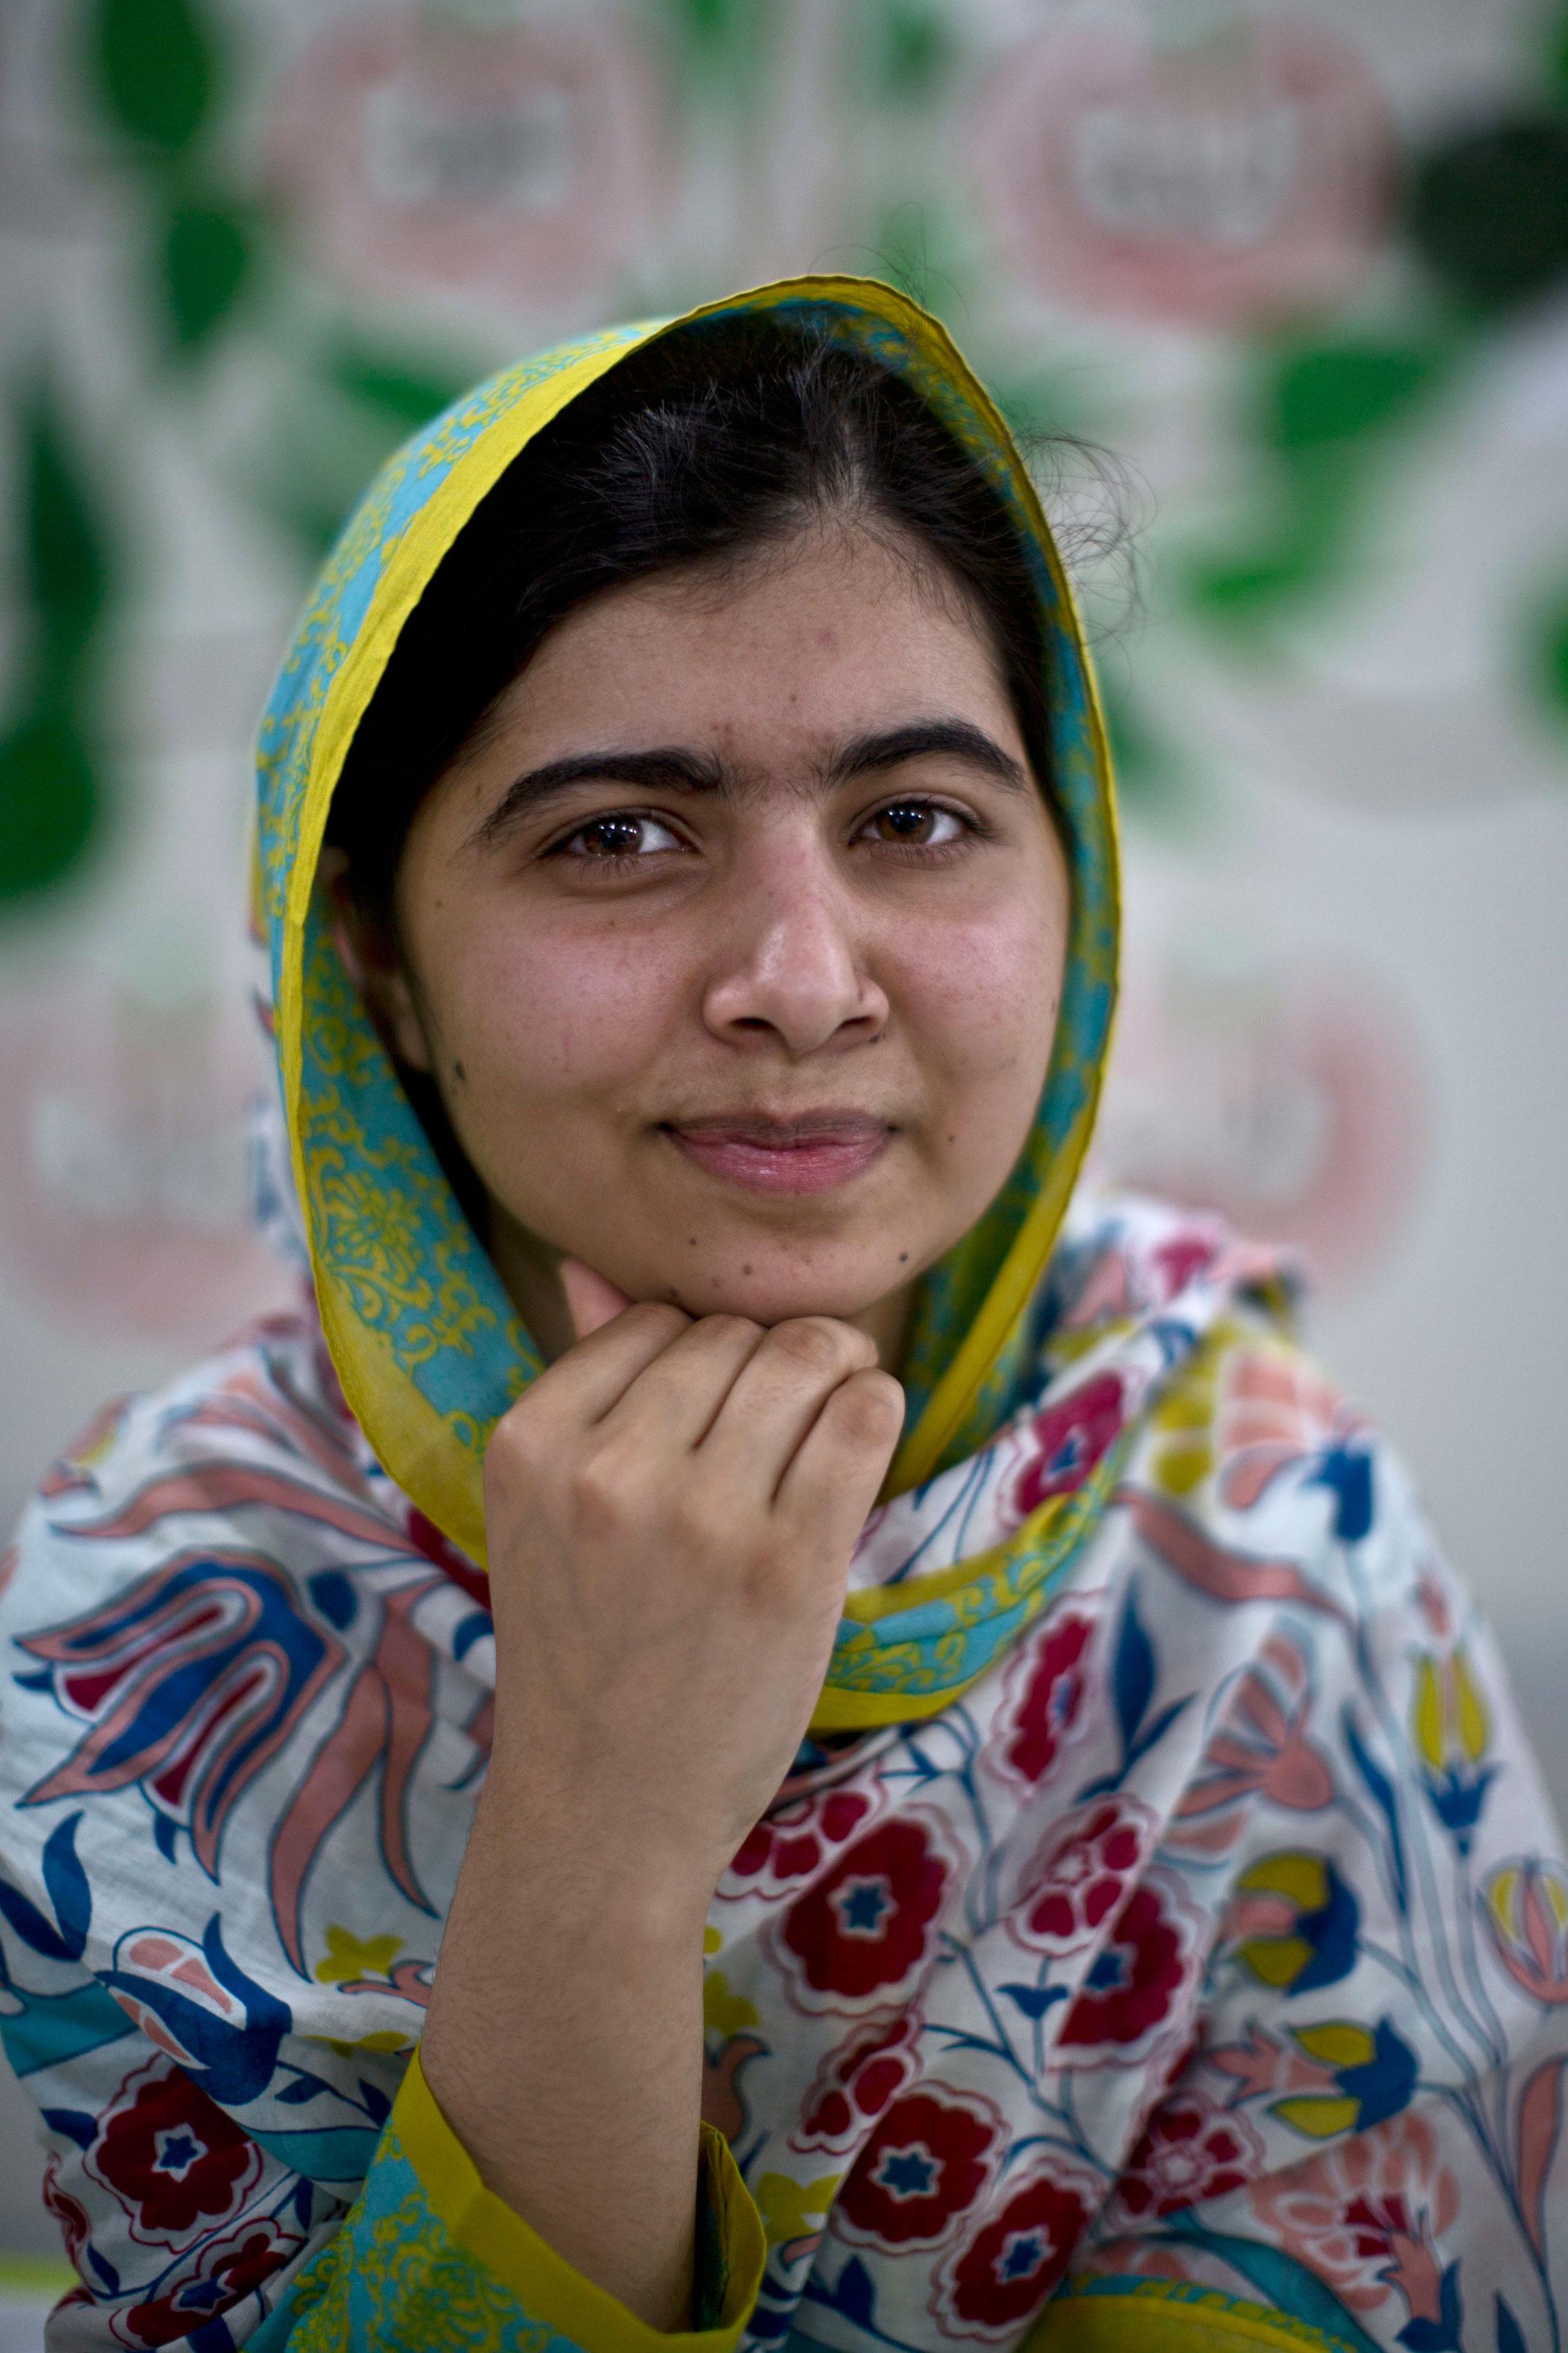 Most Influential Teens 2015 Malala Yousafzai